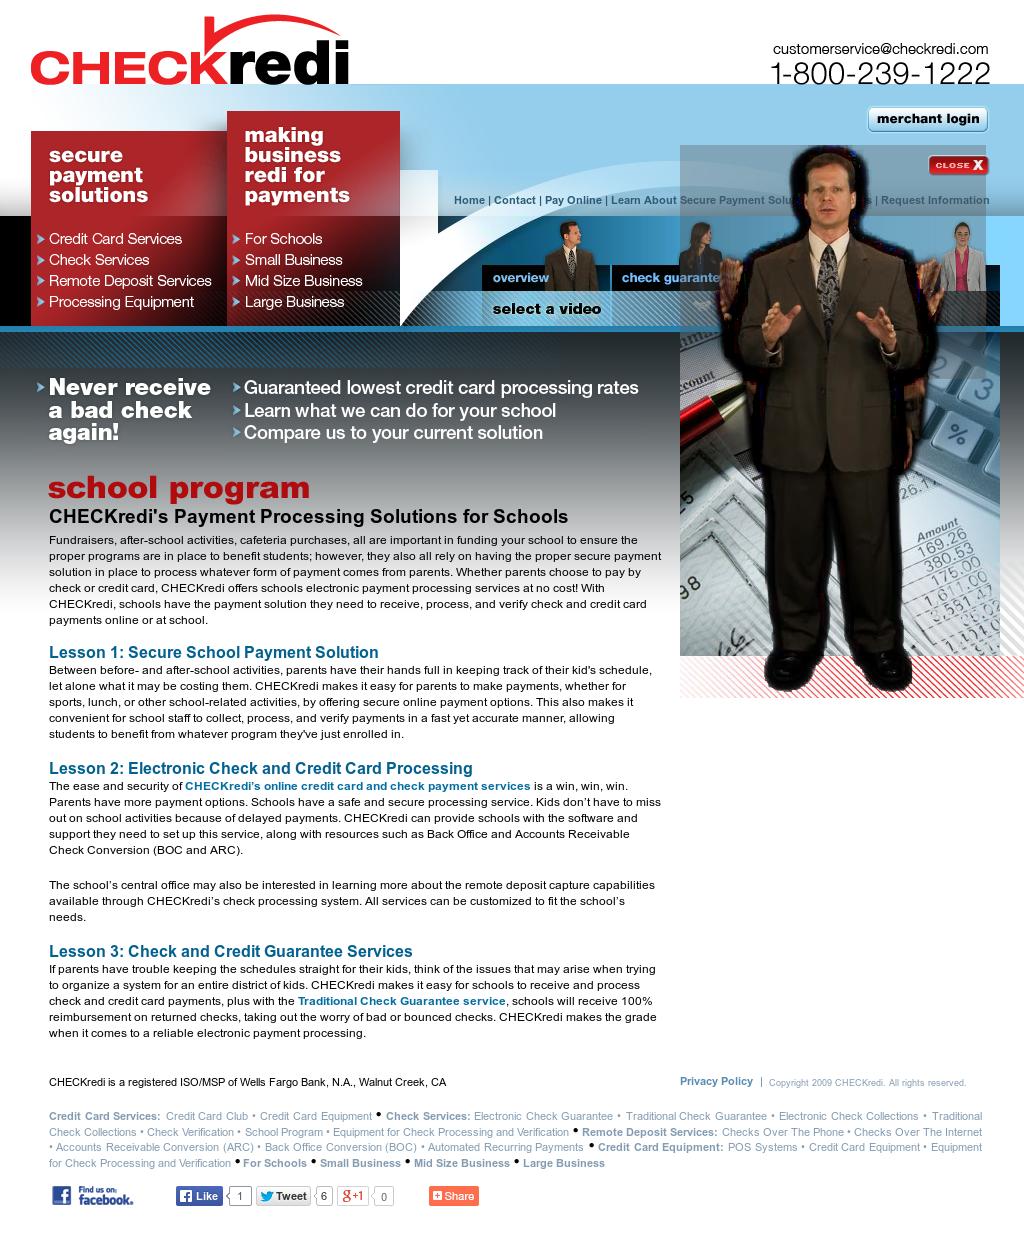 Checkredi Schools Competitors, Revenue and Employees - Owler